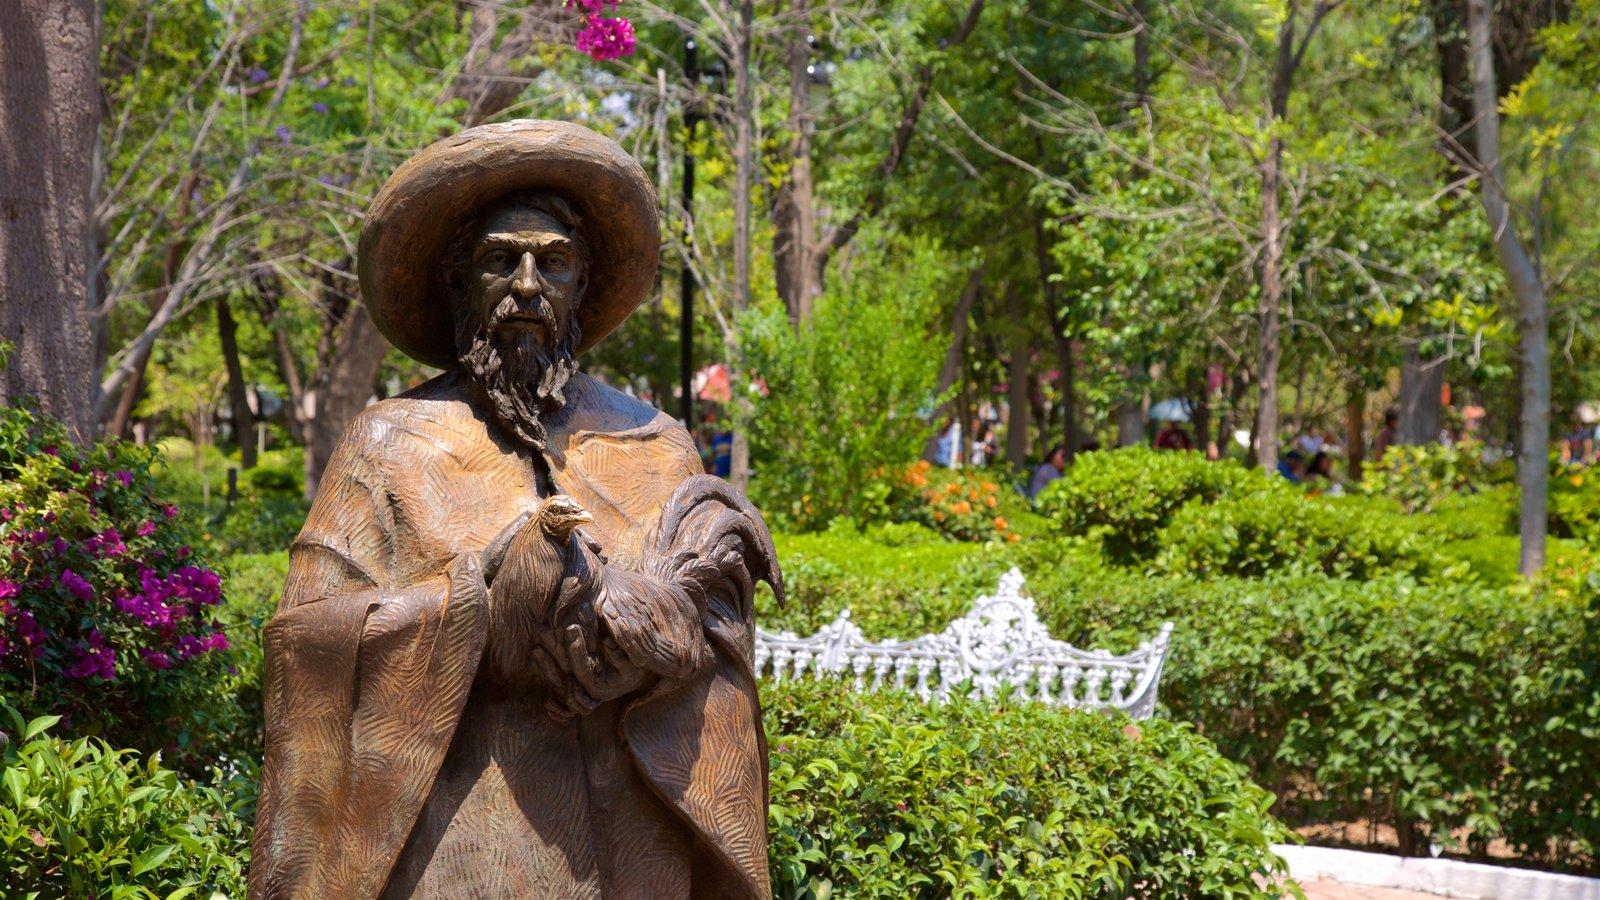 Historical Pictures: View Images of Jardin de San Marcos